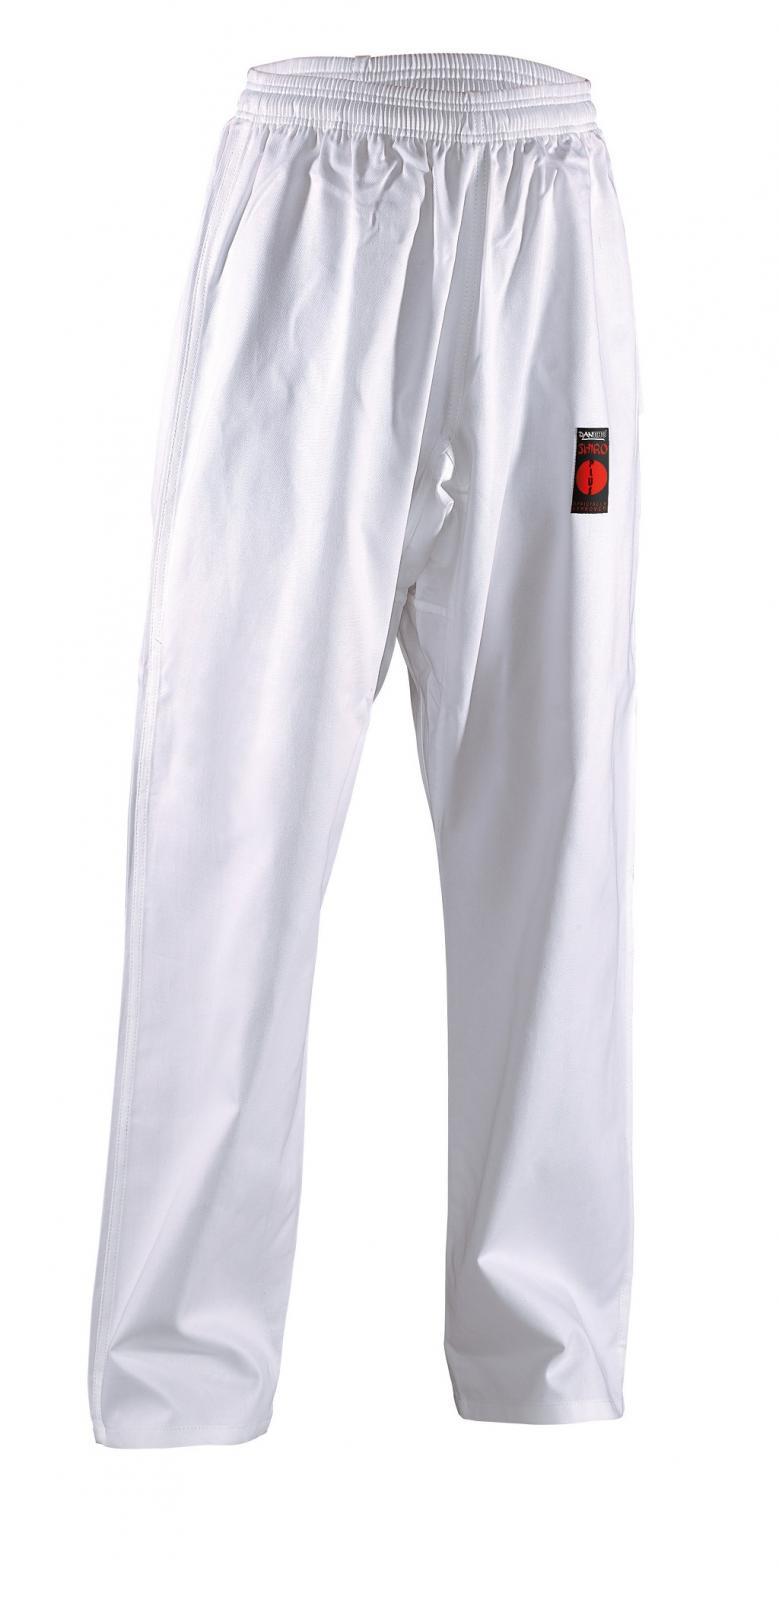 DANRHO Karatehose Shiro Plus